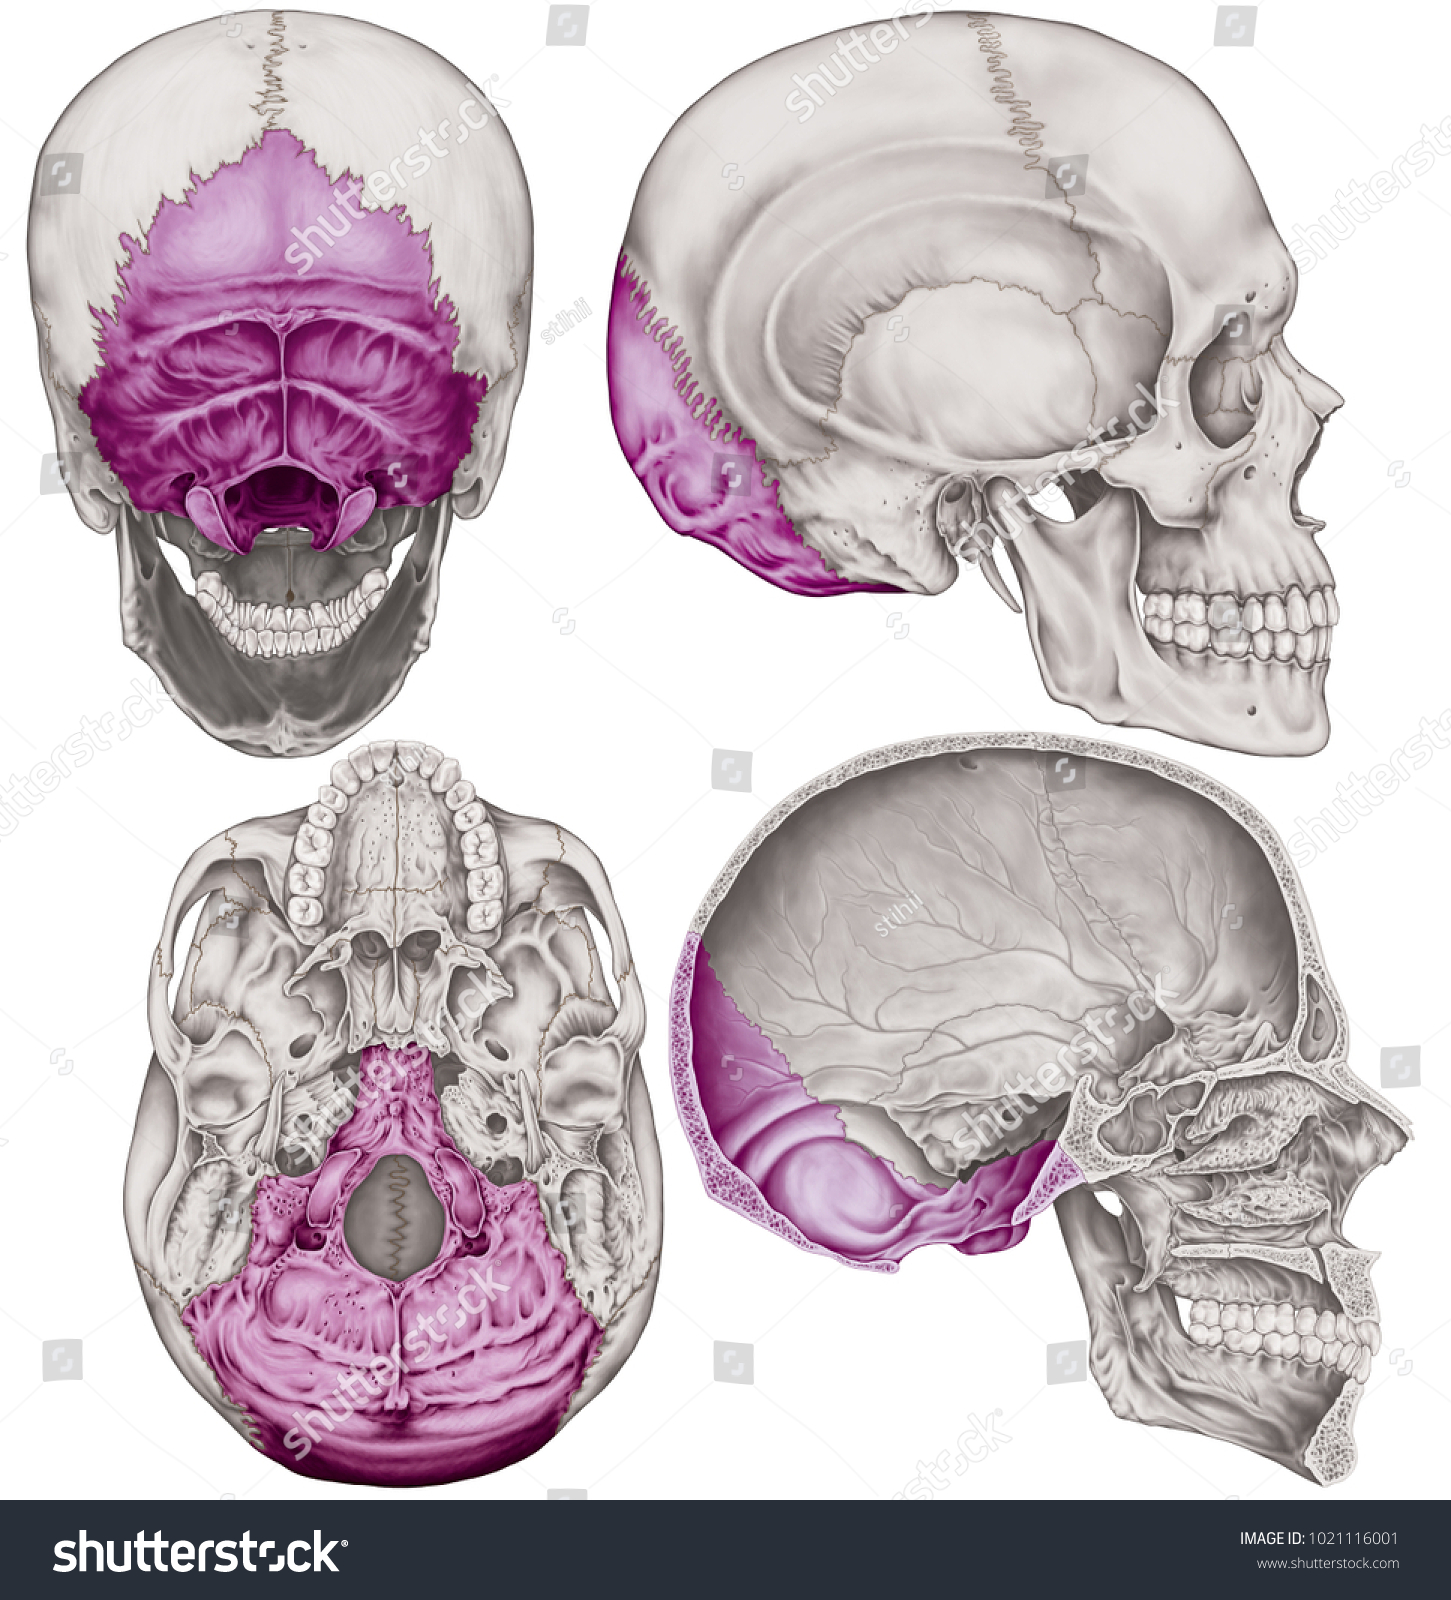 hight resolution of the occipital bone of the cranium the bones of the head skull the